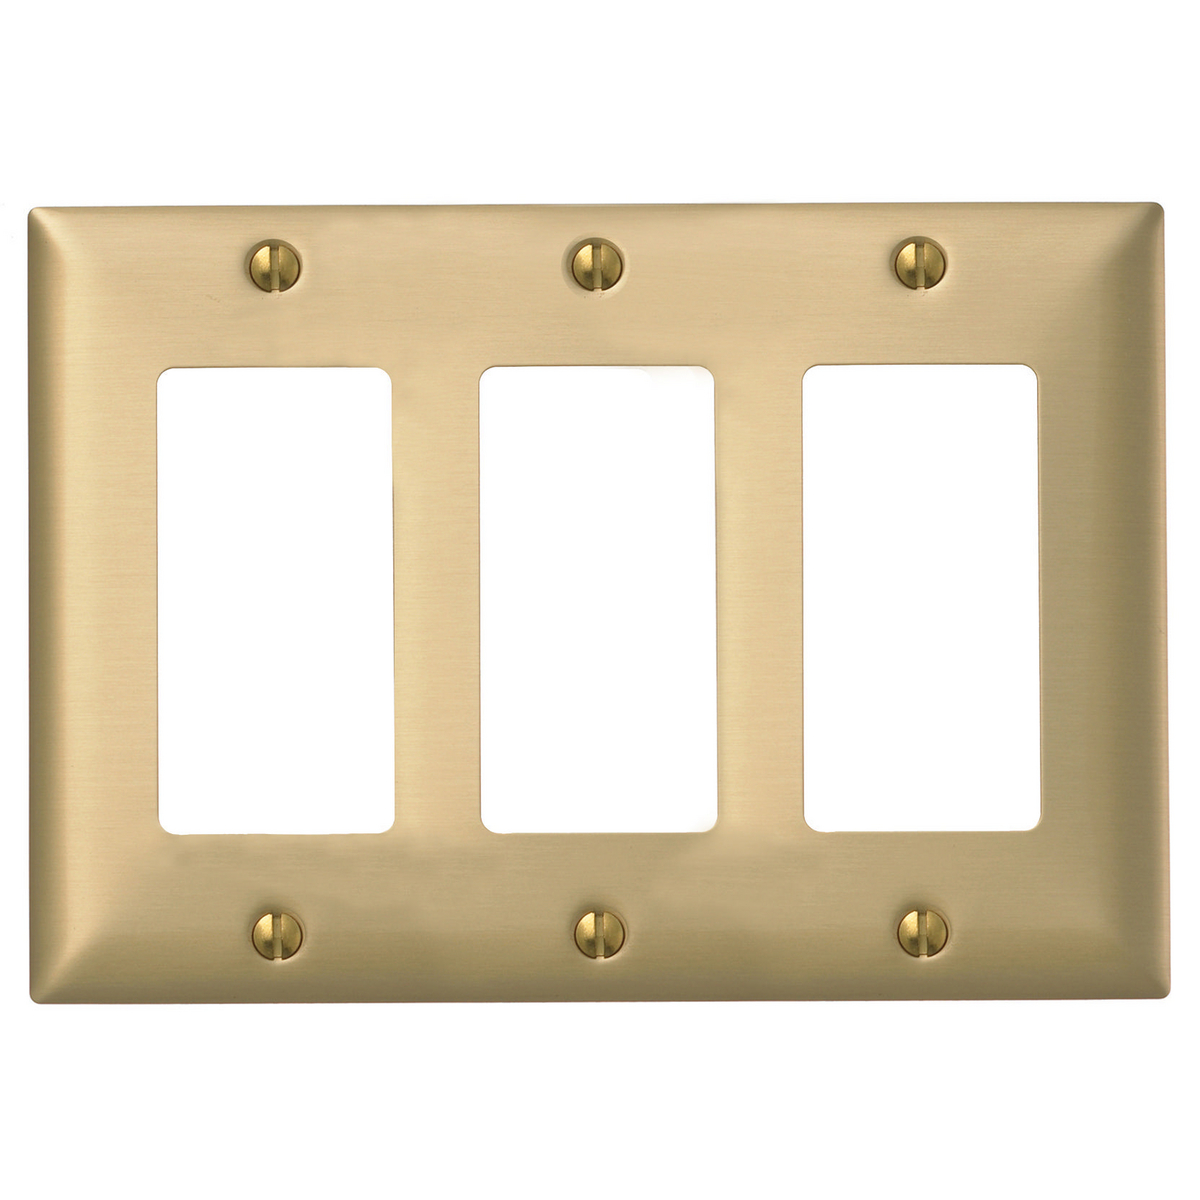 Fantastic B263 Metallic Wall Plates Wall Plates Wiring Devices Wiring Digital Resources Helishebarightsorg